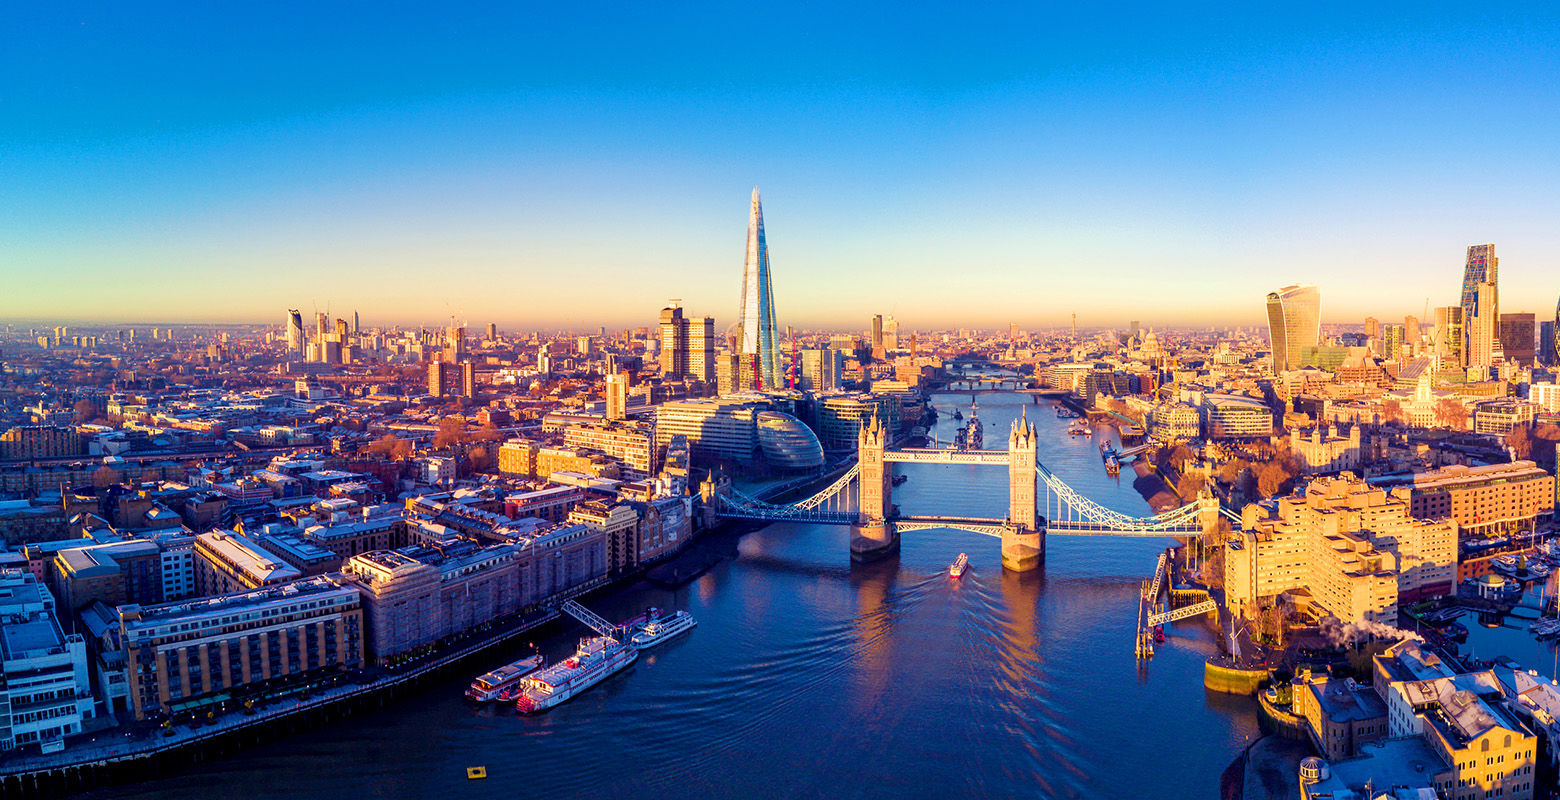 Voyage Londres 128  Vol  htel  Croisire La Tamise  Promo  Air Vacancesfr